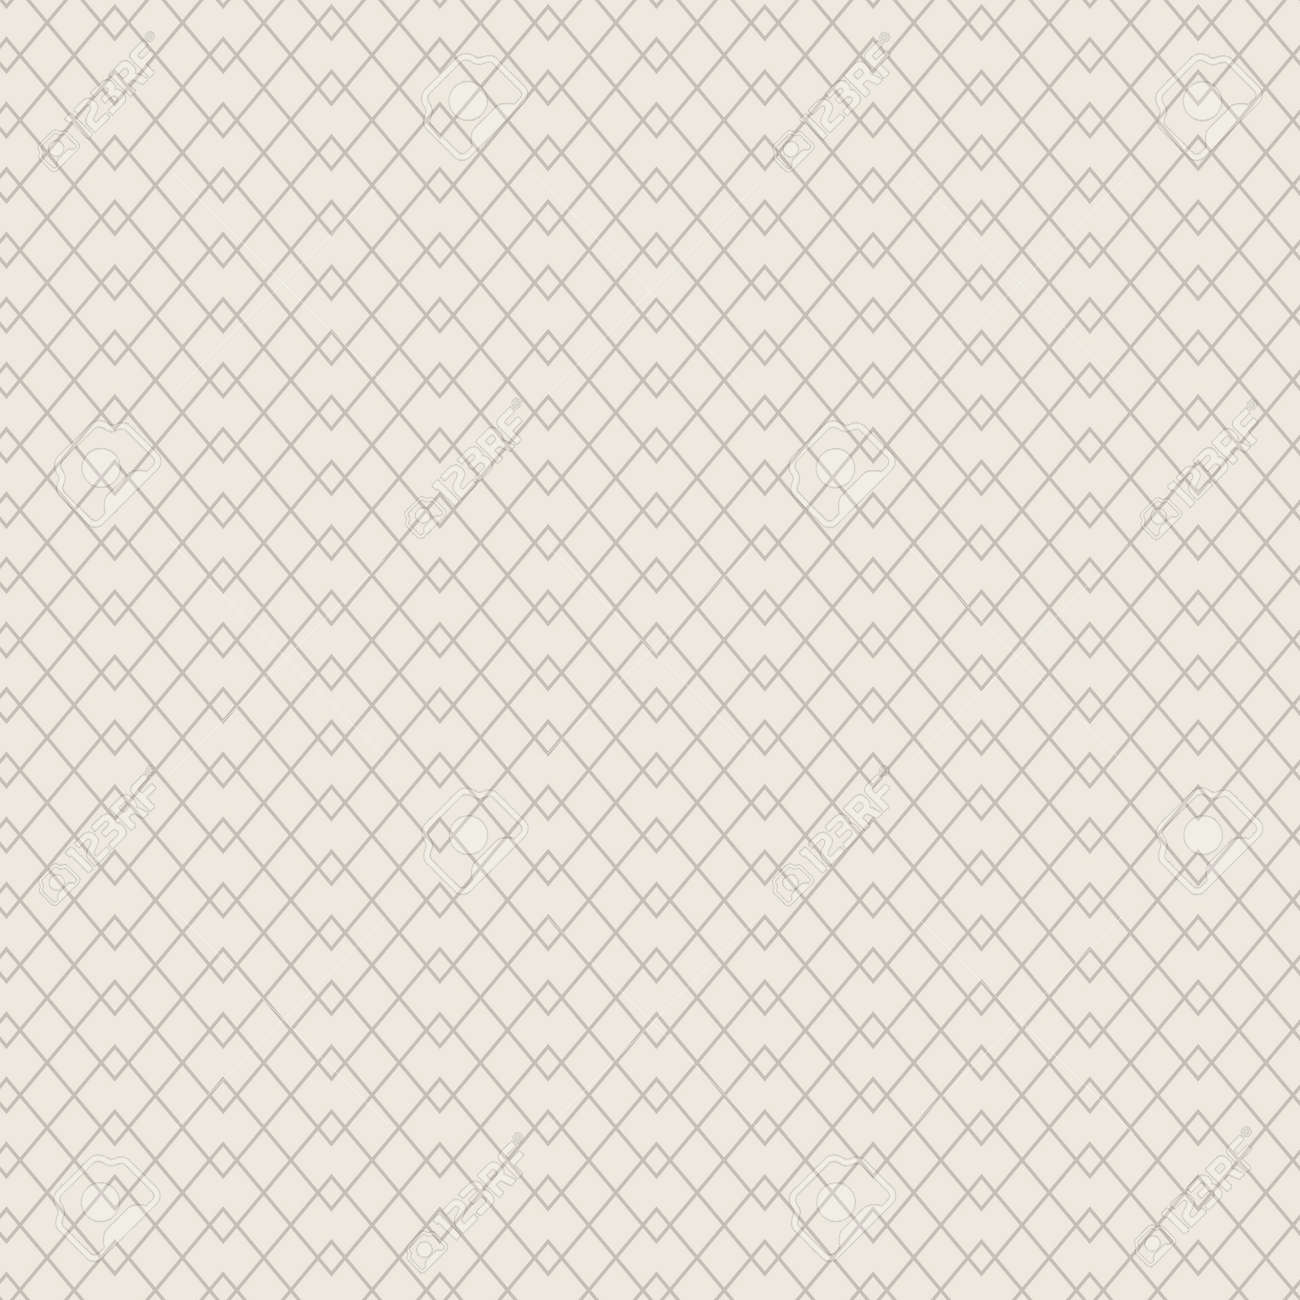 Seamless linear weaving wallpaper. - 164334472